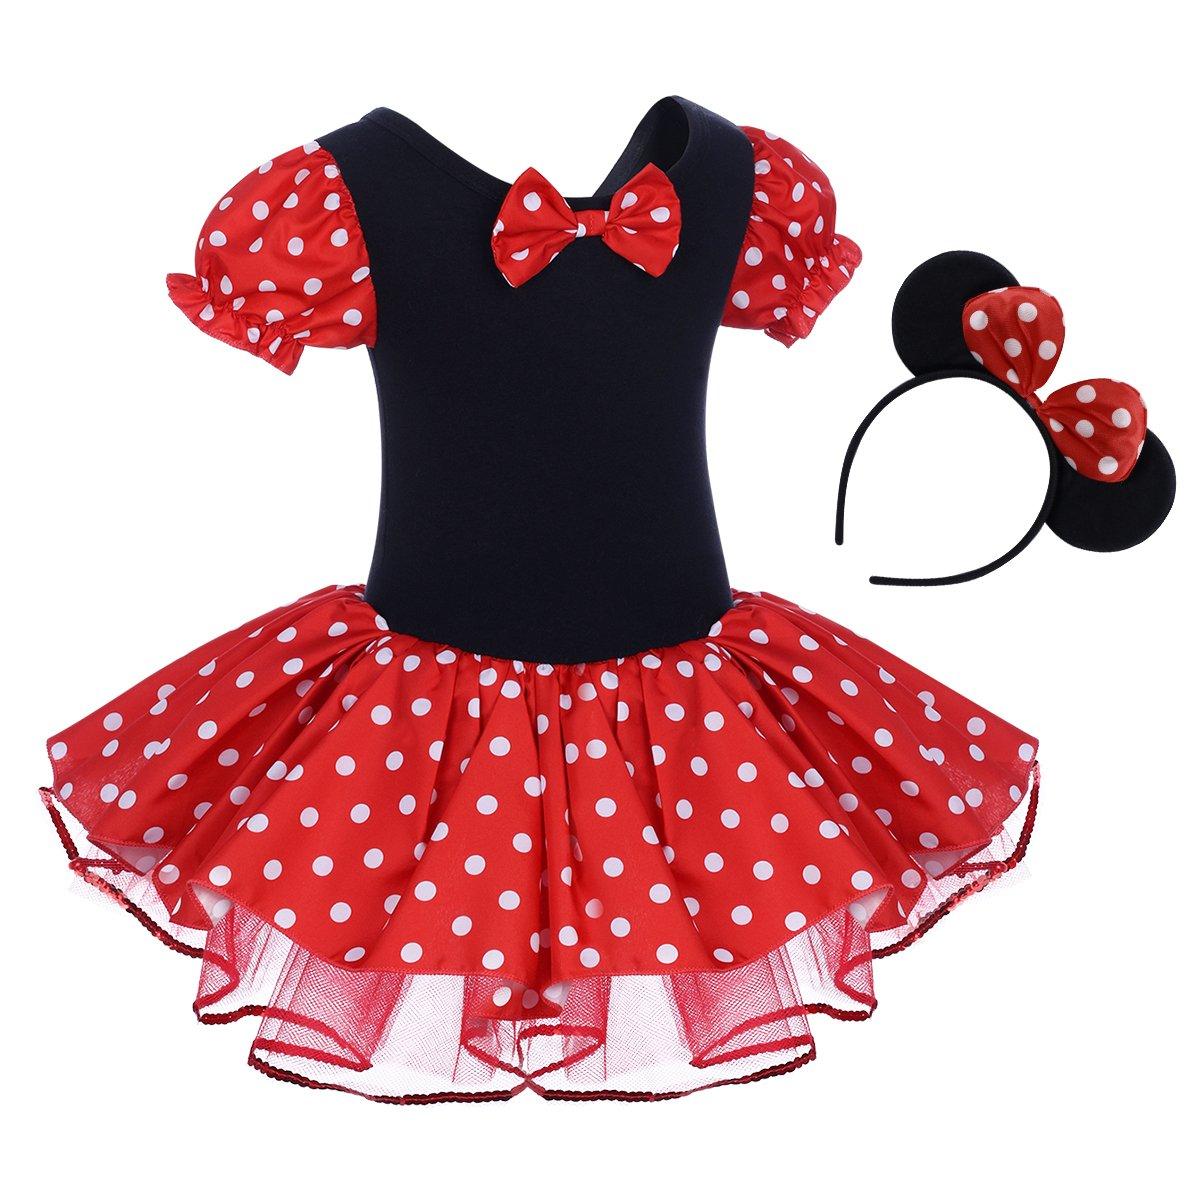 8601b6291 Amazon.com: IBTOM CASTLE Toddler Girl Polka Dots Party Fancy Costume Tutu  Dress up Dance Leotard Gymnastic Cosplay Cartoon Ear Headband: Clothing